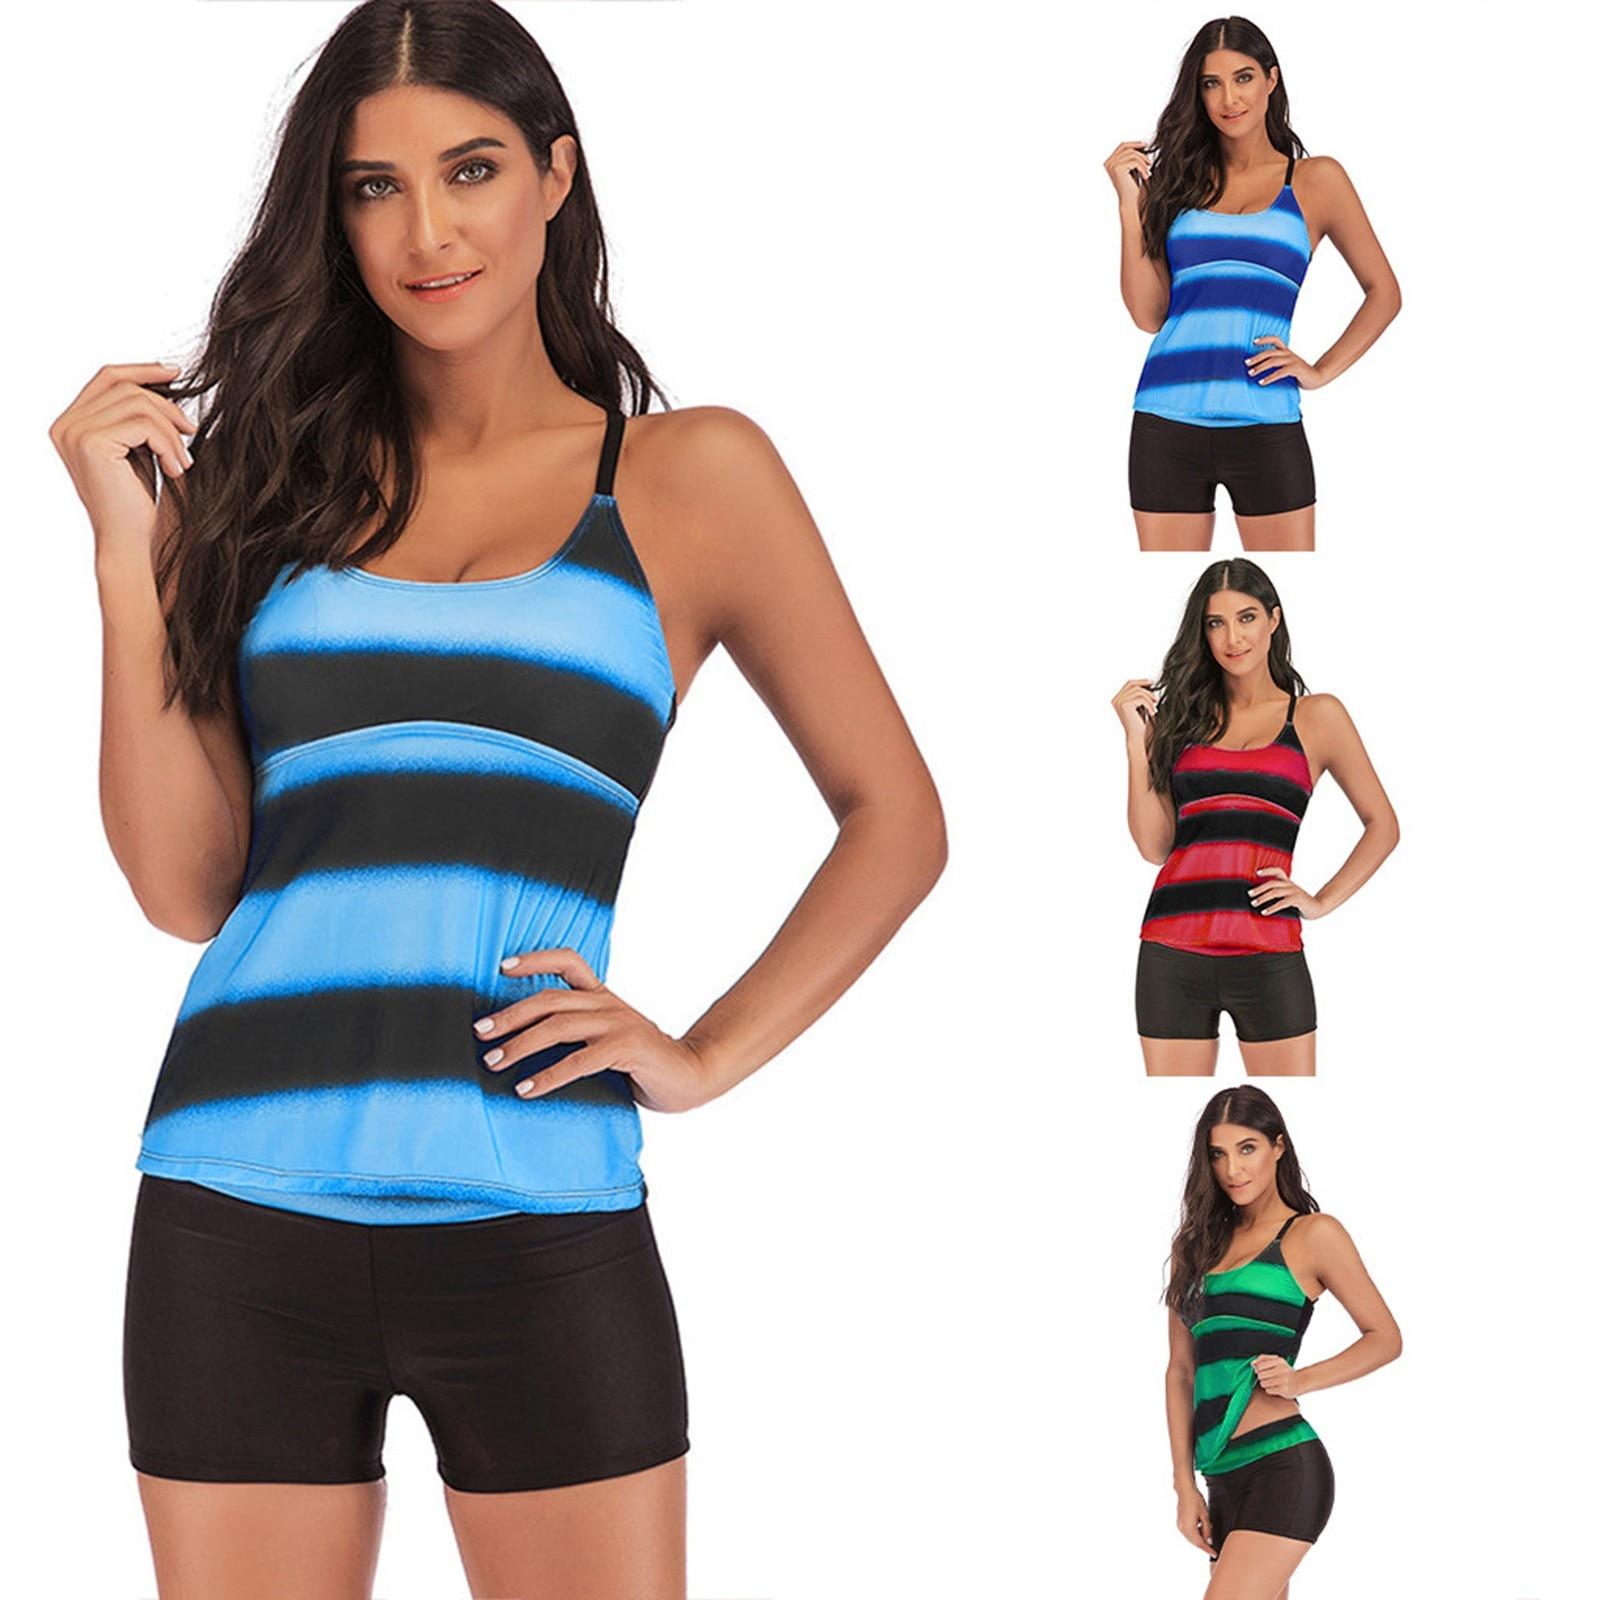 Women Beachwear Plus Size 5xl Tankini Set Push-up Striped Print Two Piece Swimsuit Conservative Summer Beach Swimwear Top+shorts lace up print tankini set swimwear